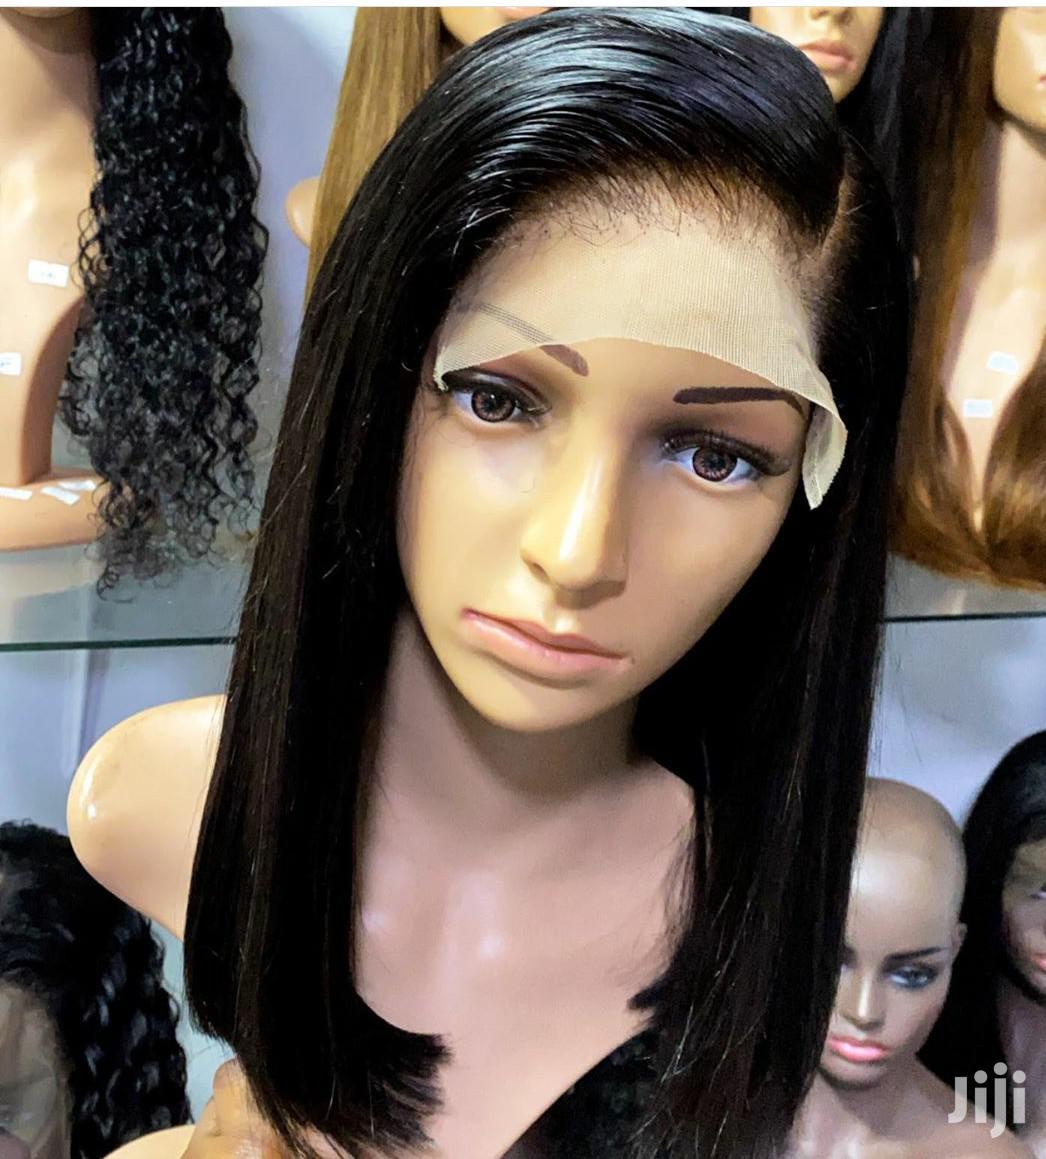 Indian Remy Wig Cap 100% Virgin Human Hair